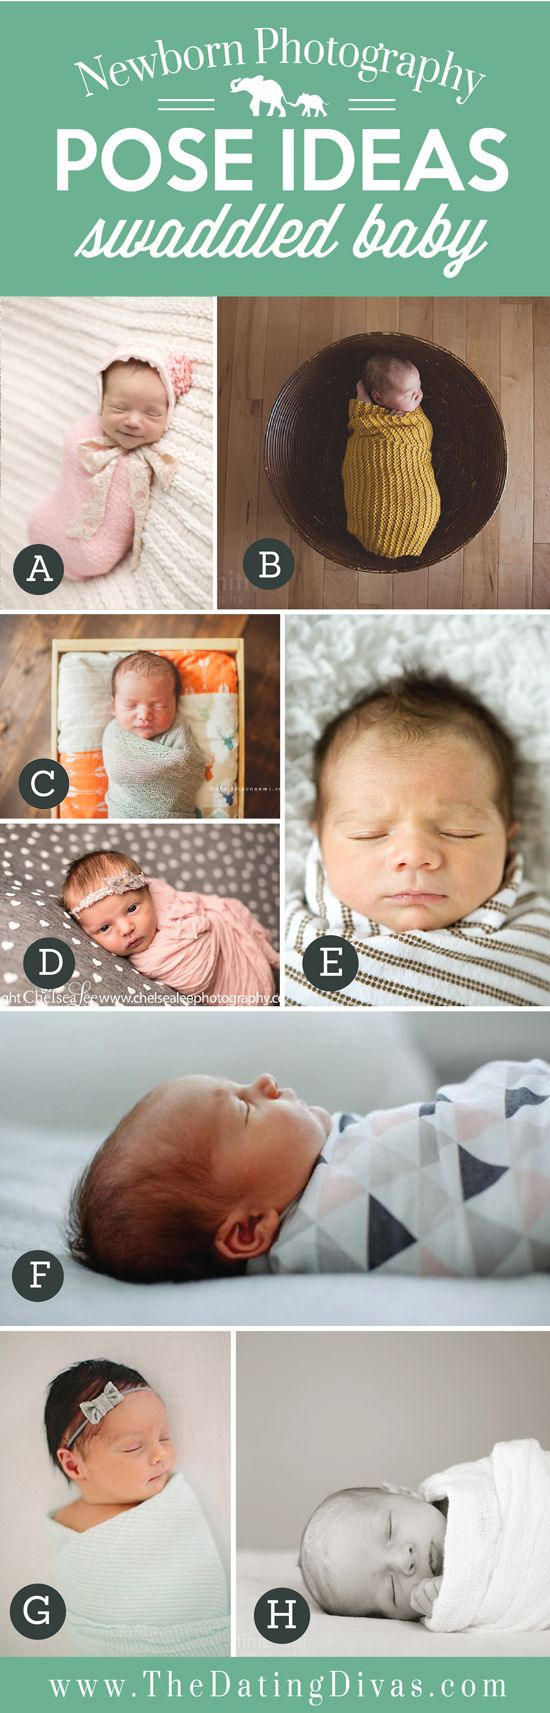 newborn baby care tips pdf